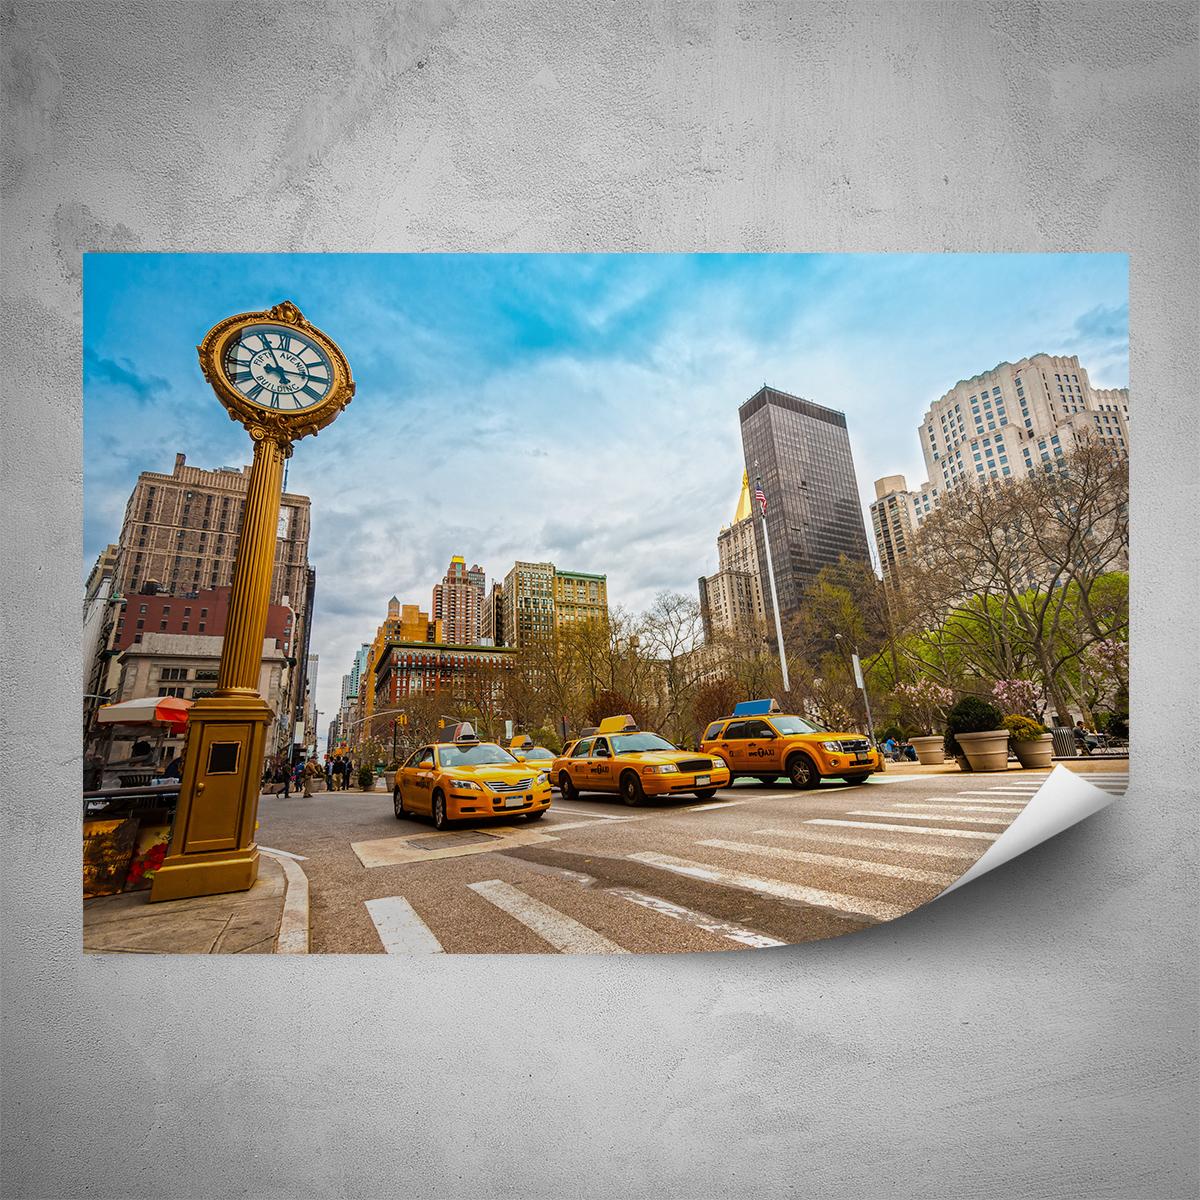 Plakát - New York Taxi - 60x40 cm - PopyDesign